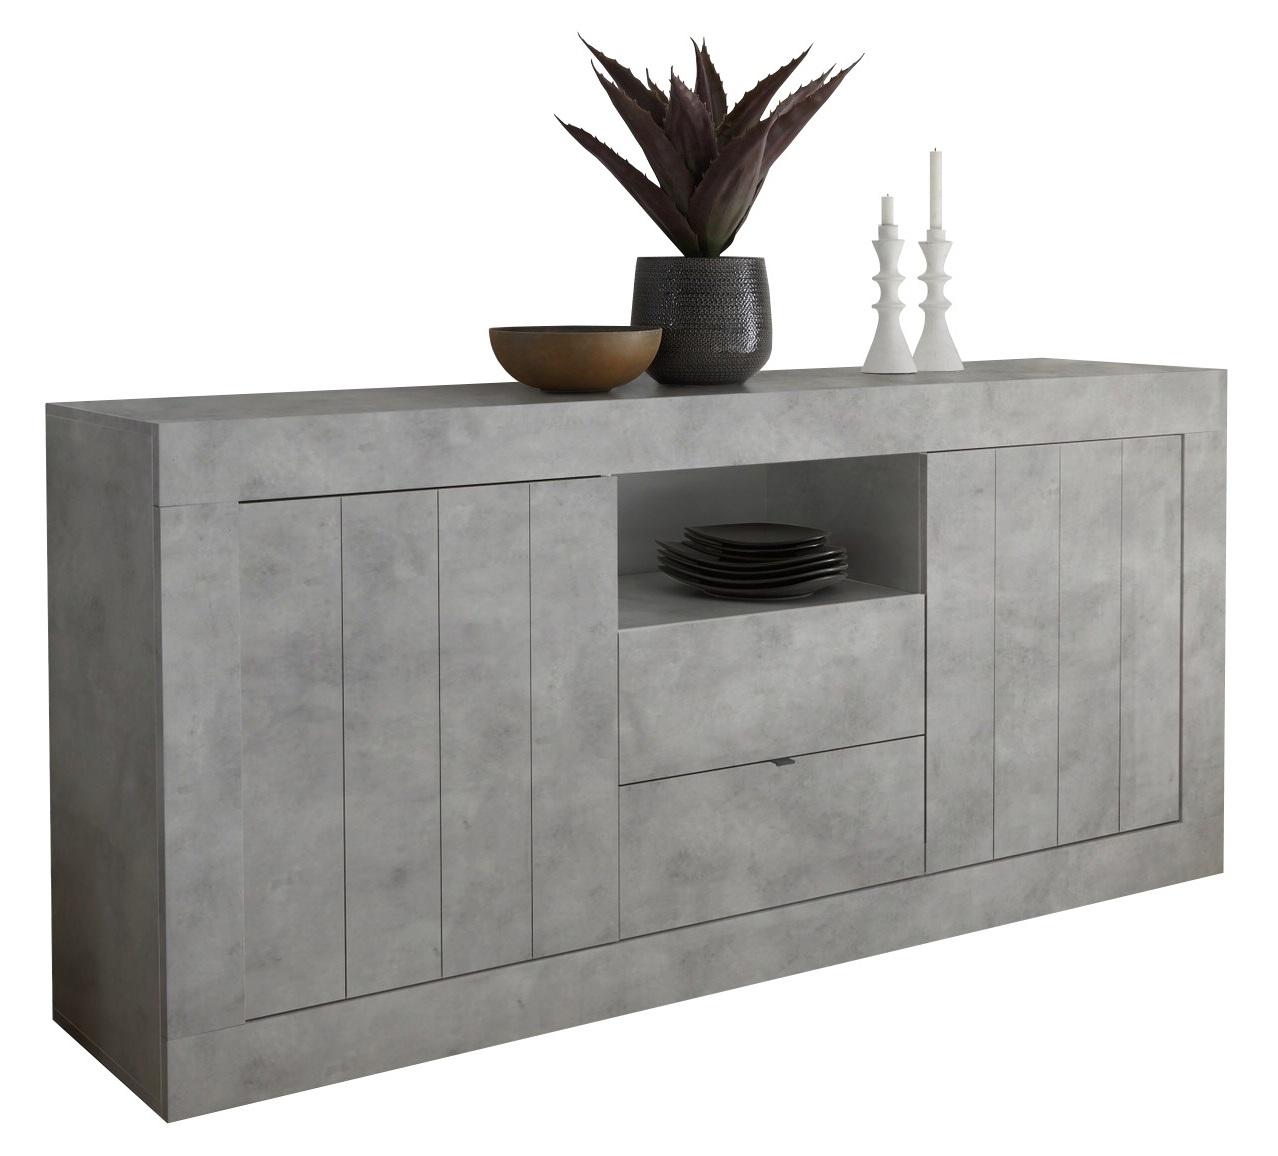 Dressoir Urbino 184 cm breed in grijs beton | Pesaro Mobilia